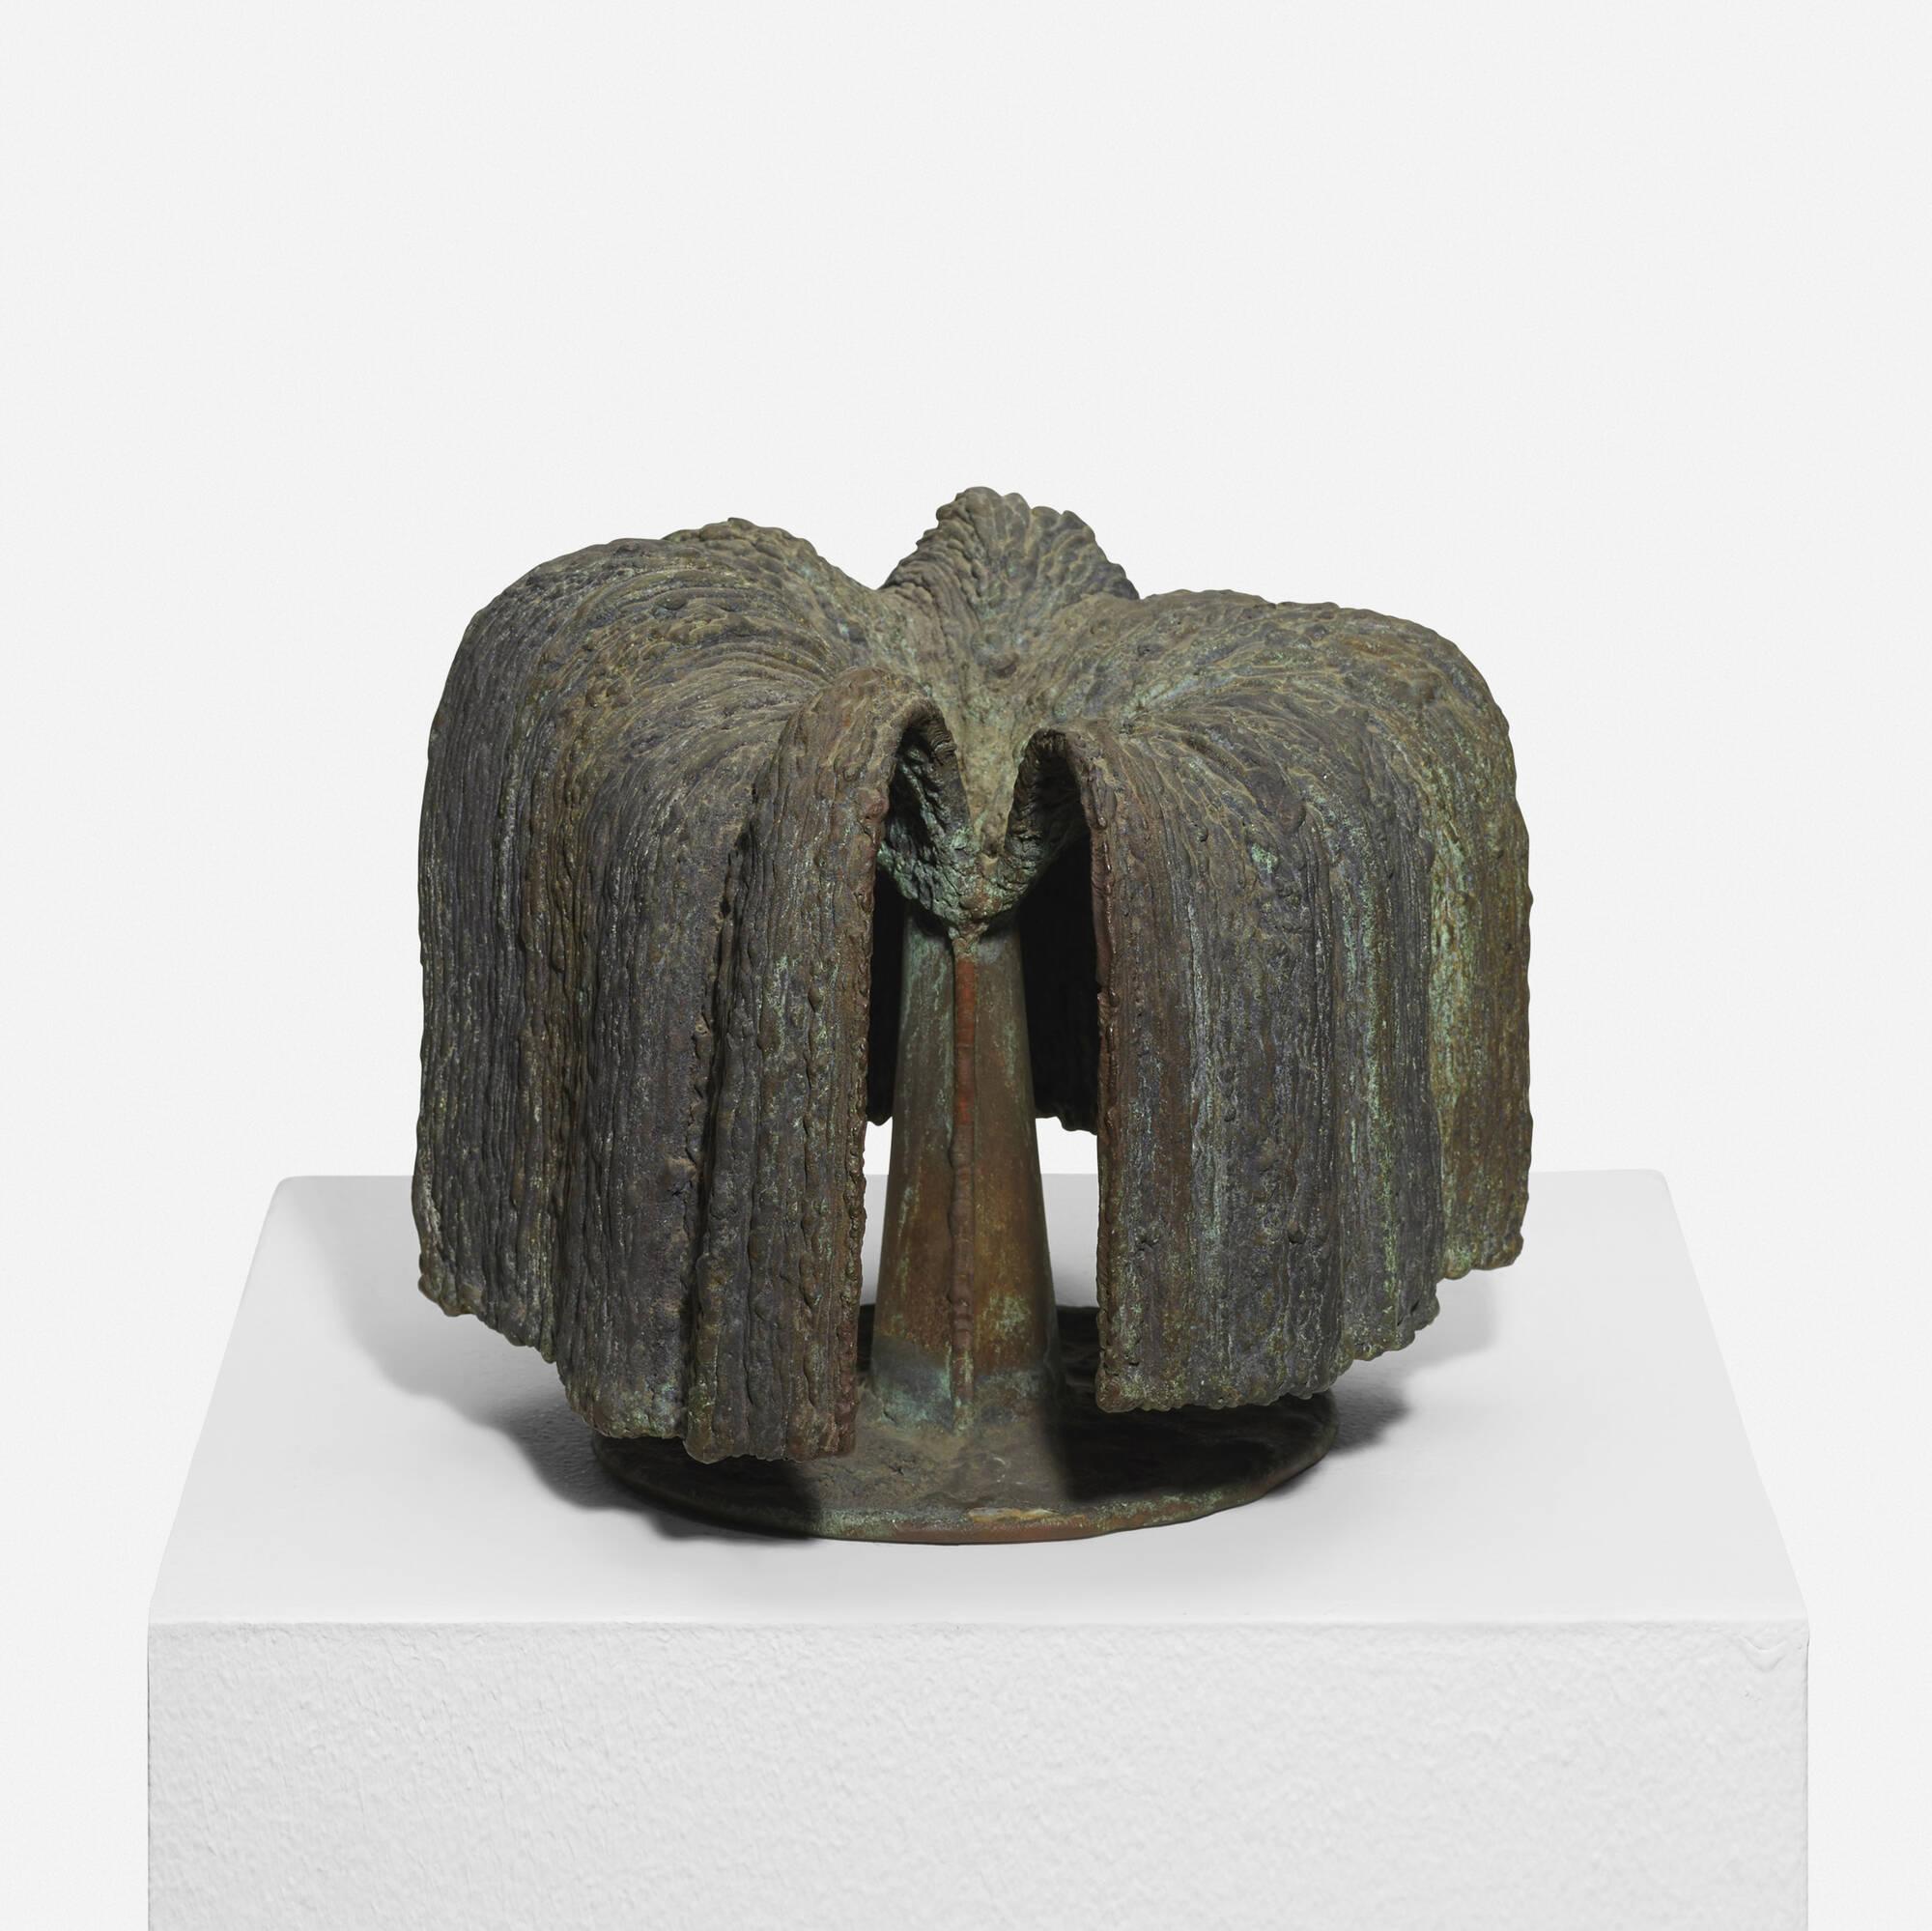 188: Harry Bertoia / Untitled (Welded Form) (2 of 4)